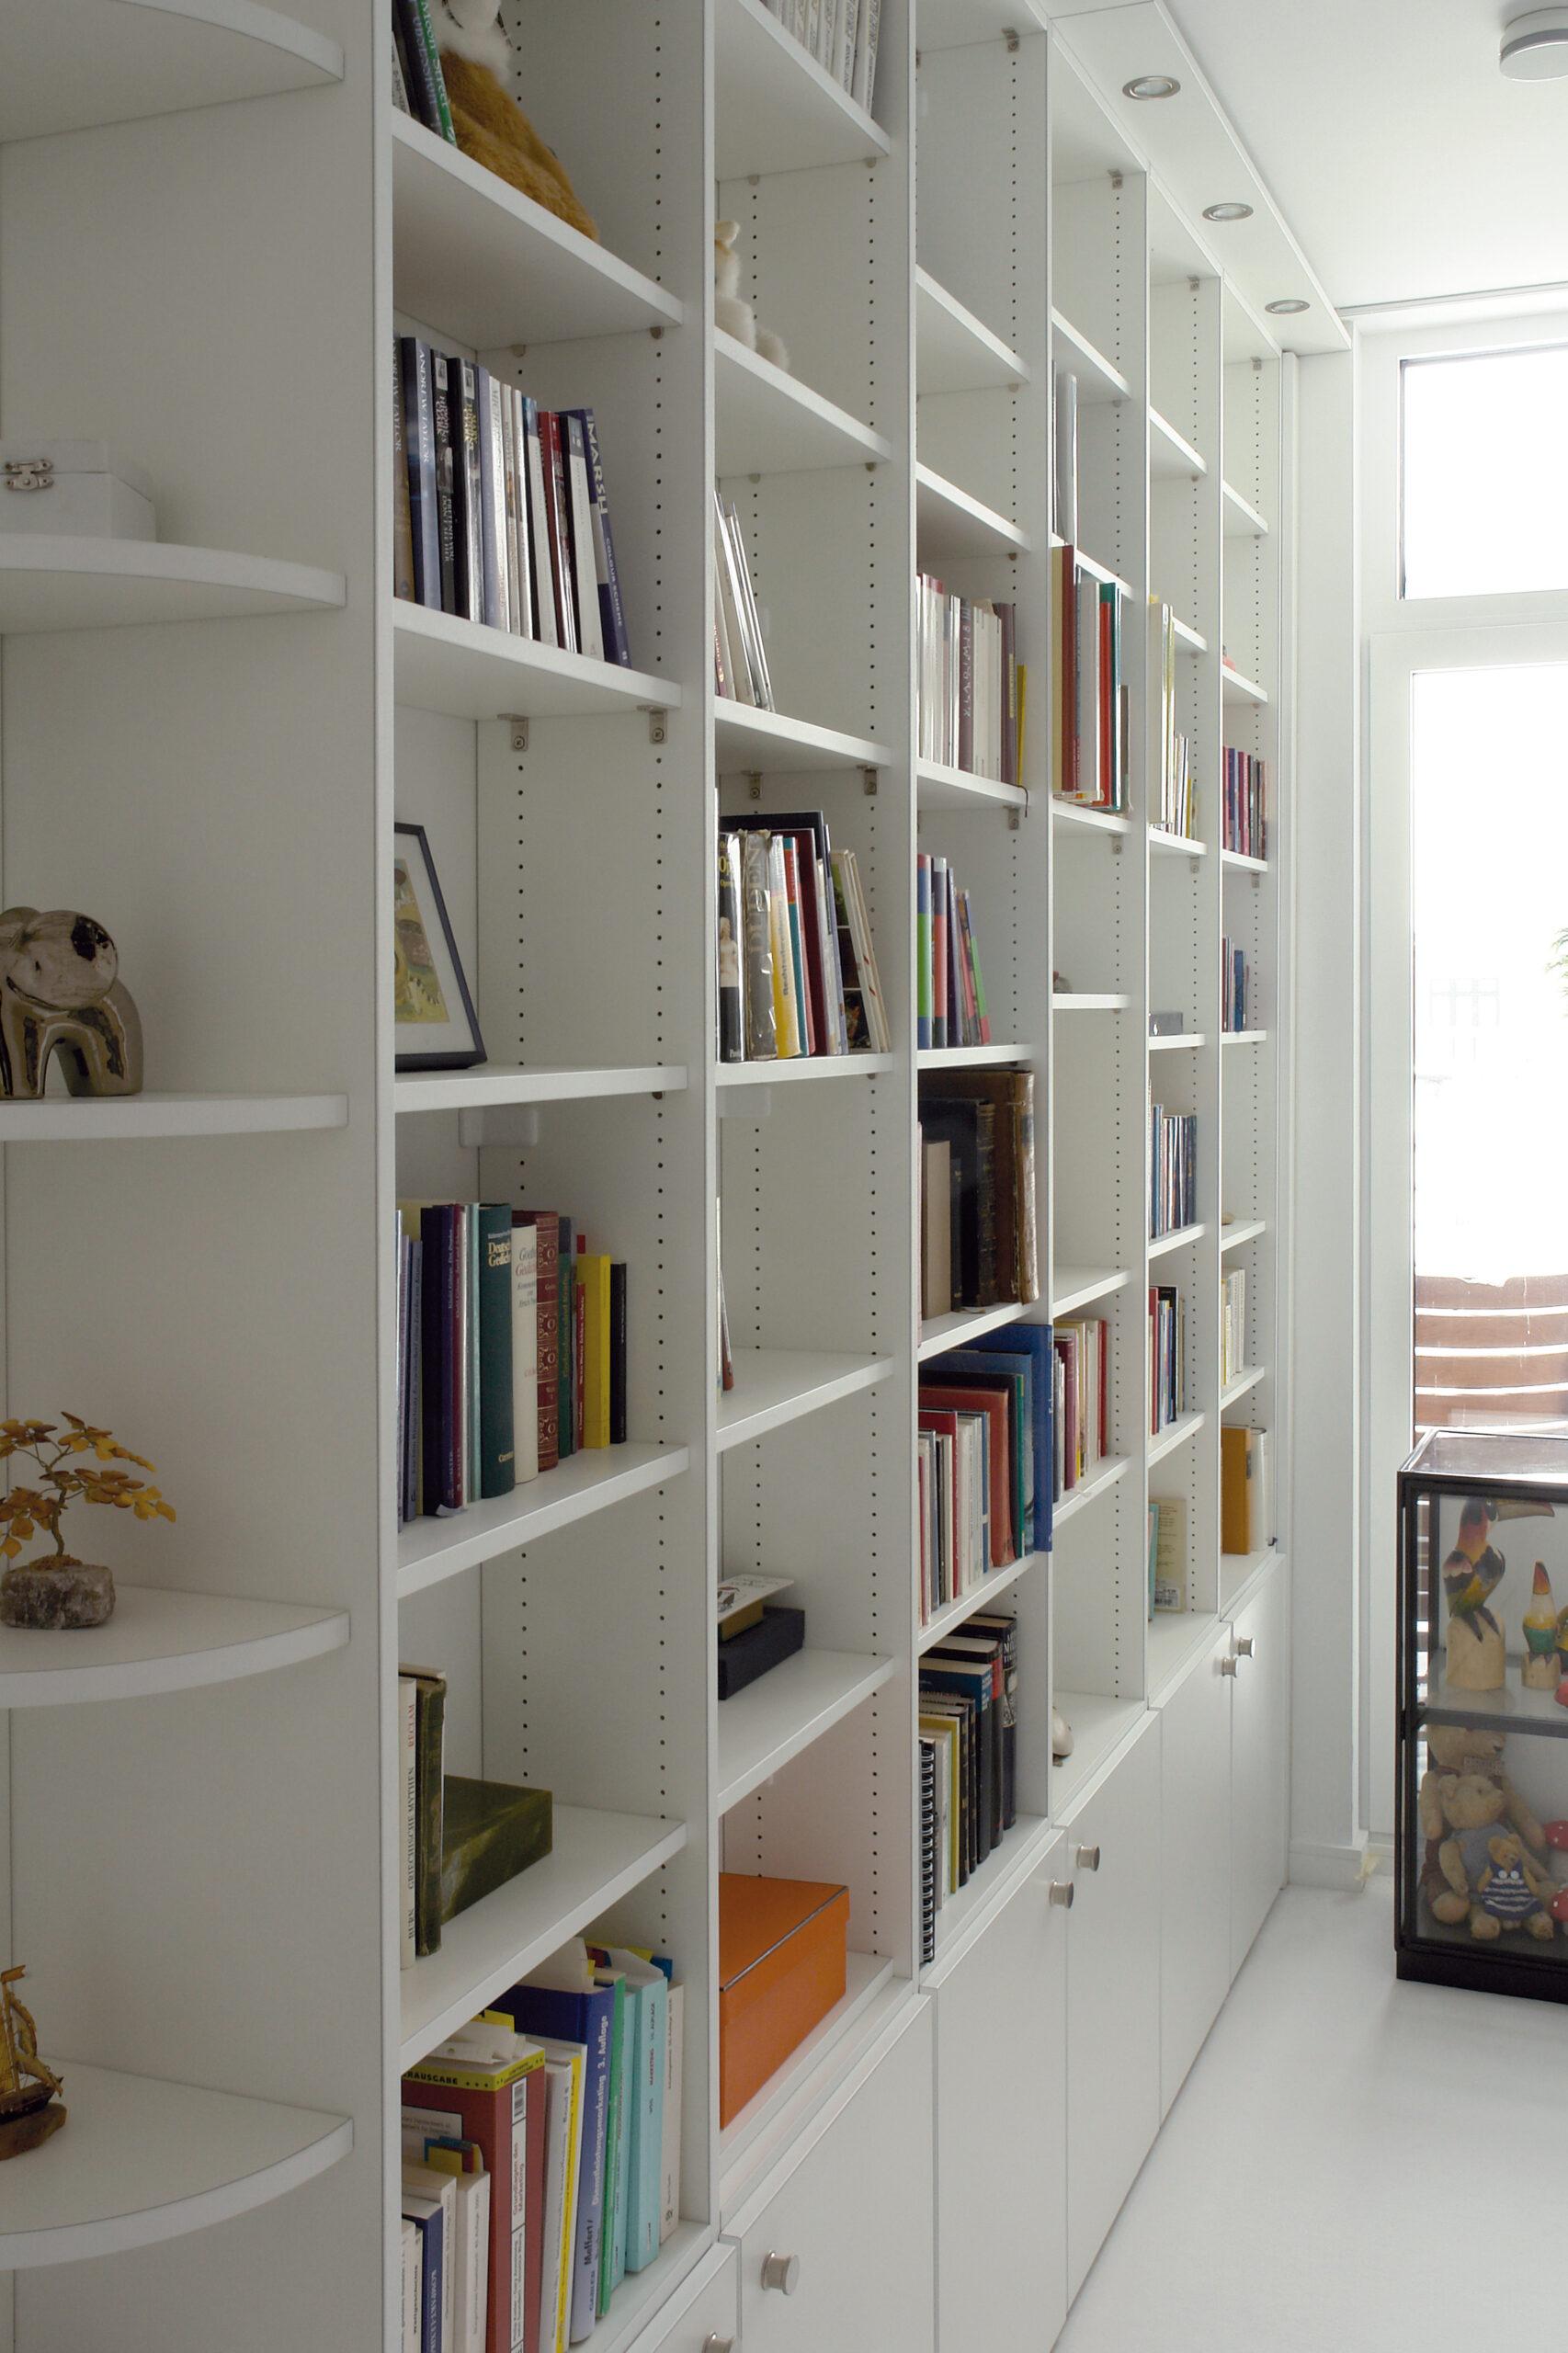 Bookshelf_46